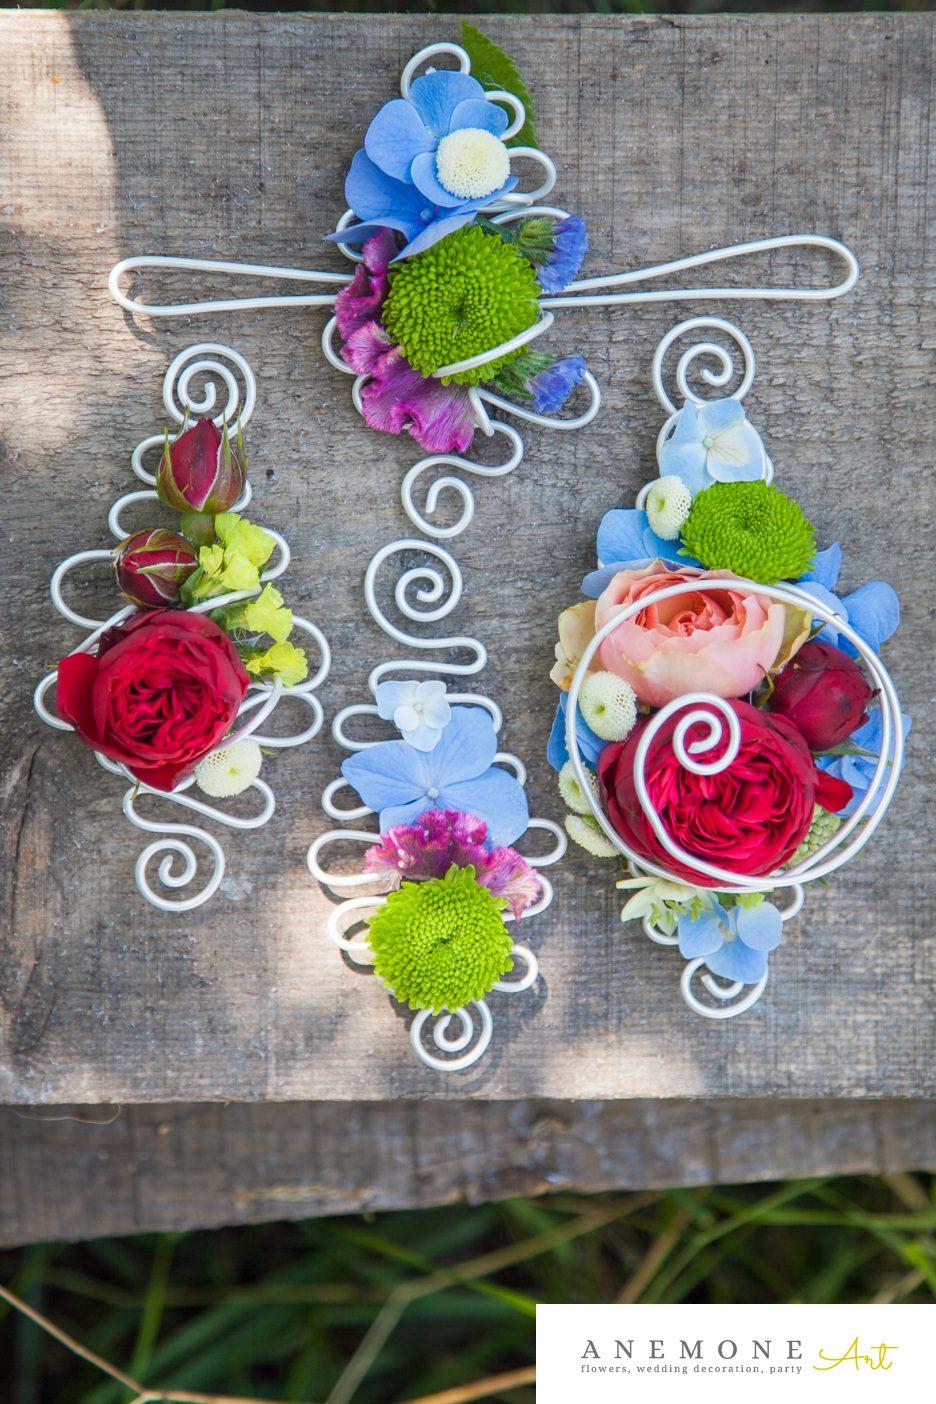 Poza, foto cu Flori de nunta bratara, cocarda in Arad, Timisoara, Oradea (wedding flowers, bouquets) nunta Arad, Timisoara, Oradea